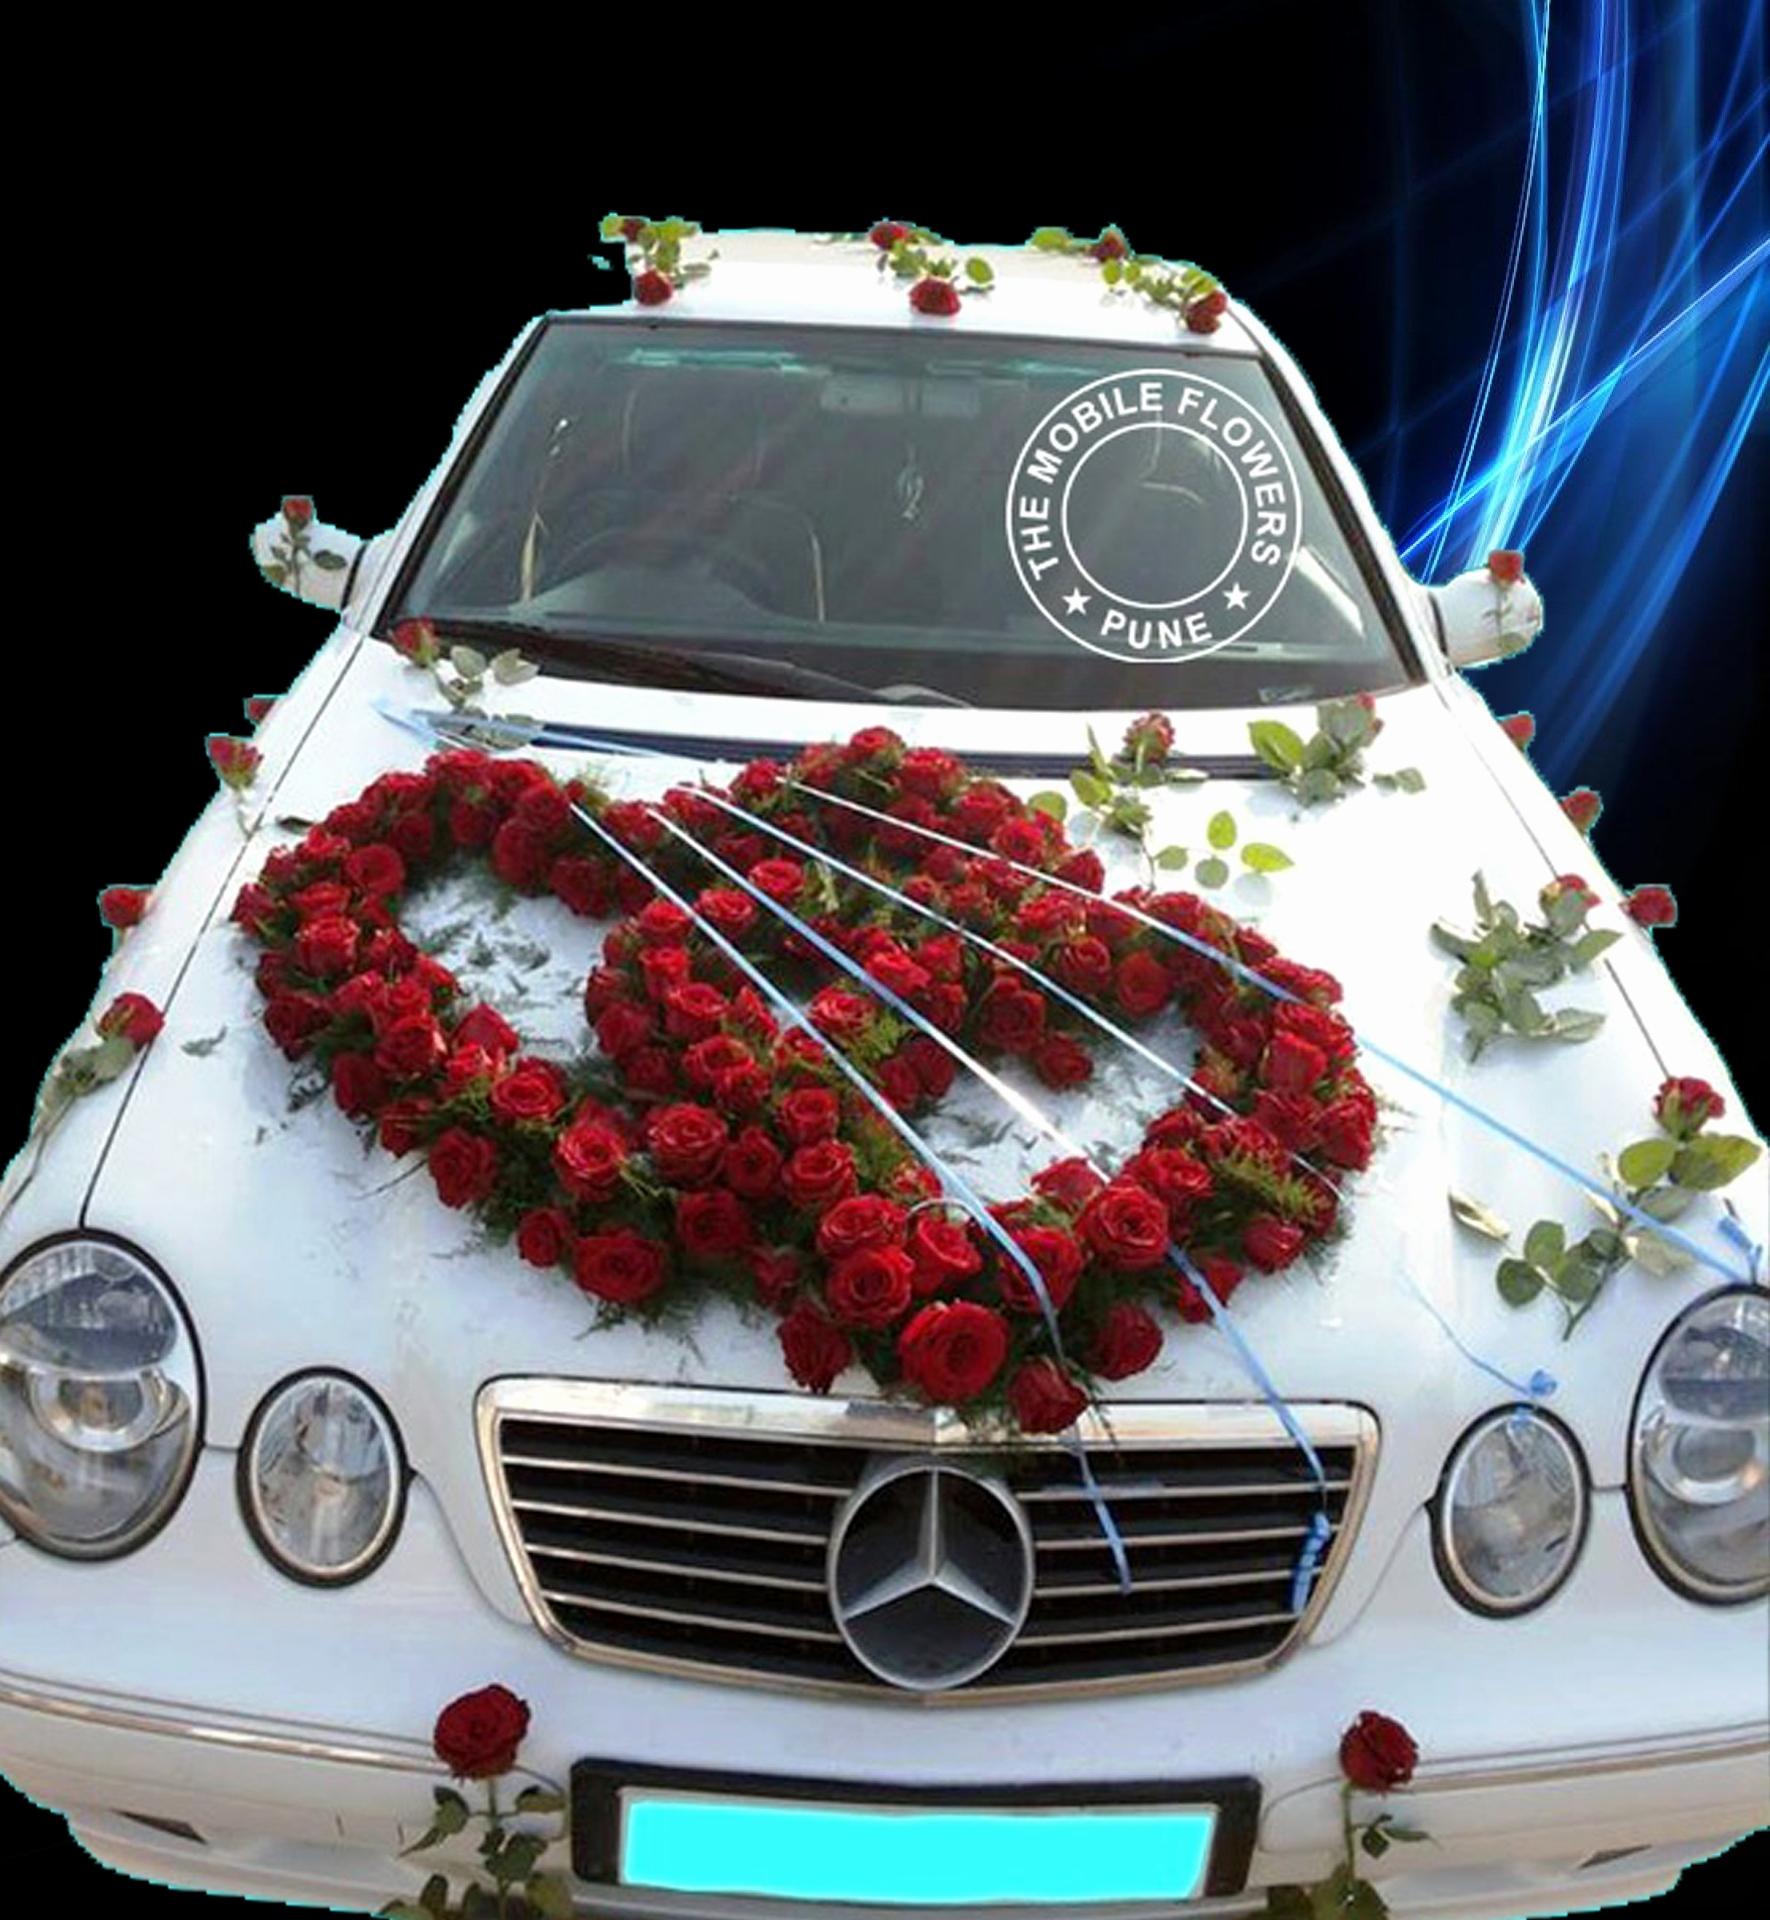 Decorated car photo